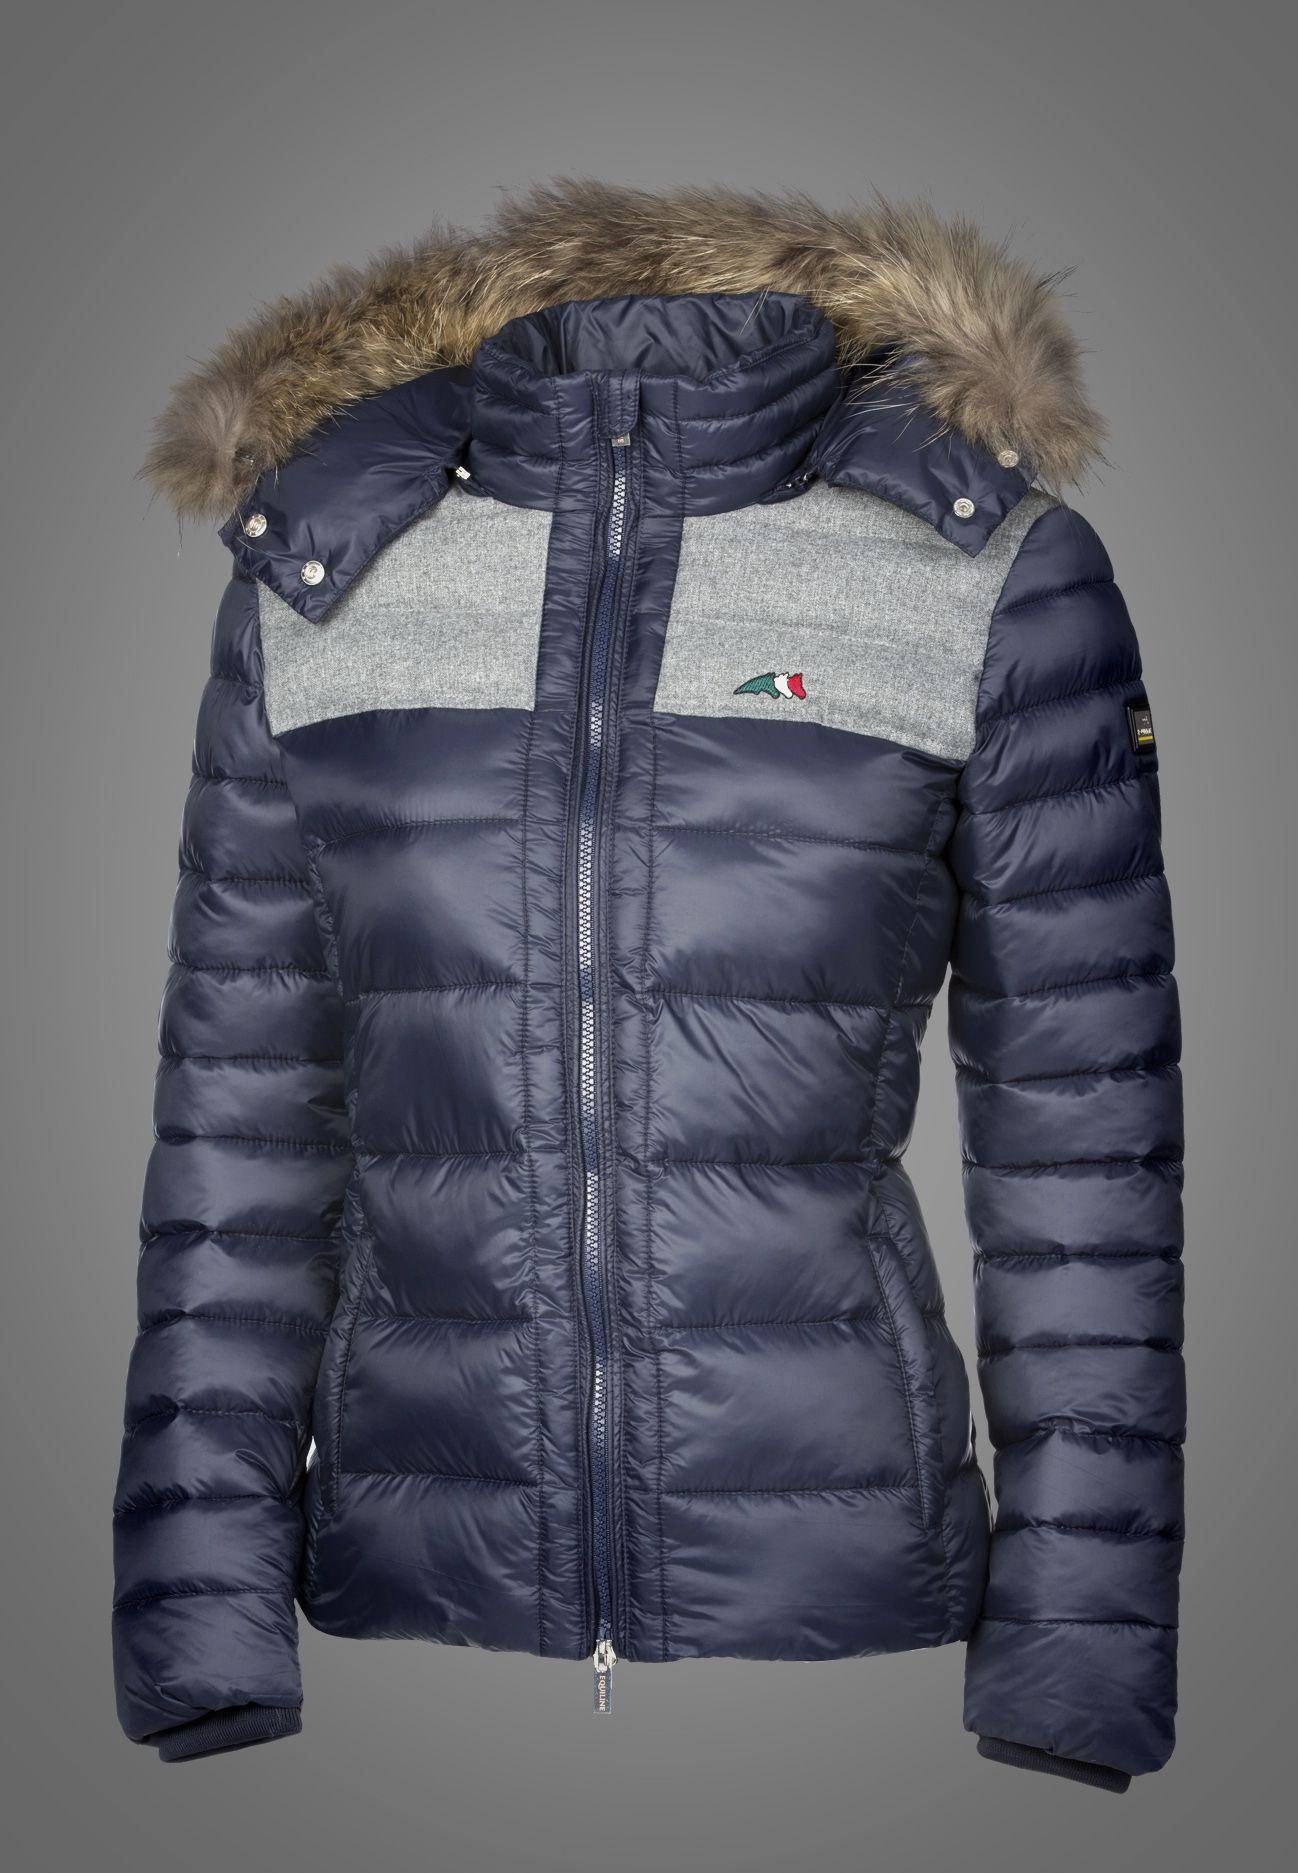 f14a294156074 2017 Padding Pinterest Giuliet Winter 3d Hipica Jacket Fall xznZHTa